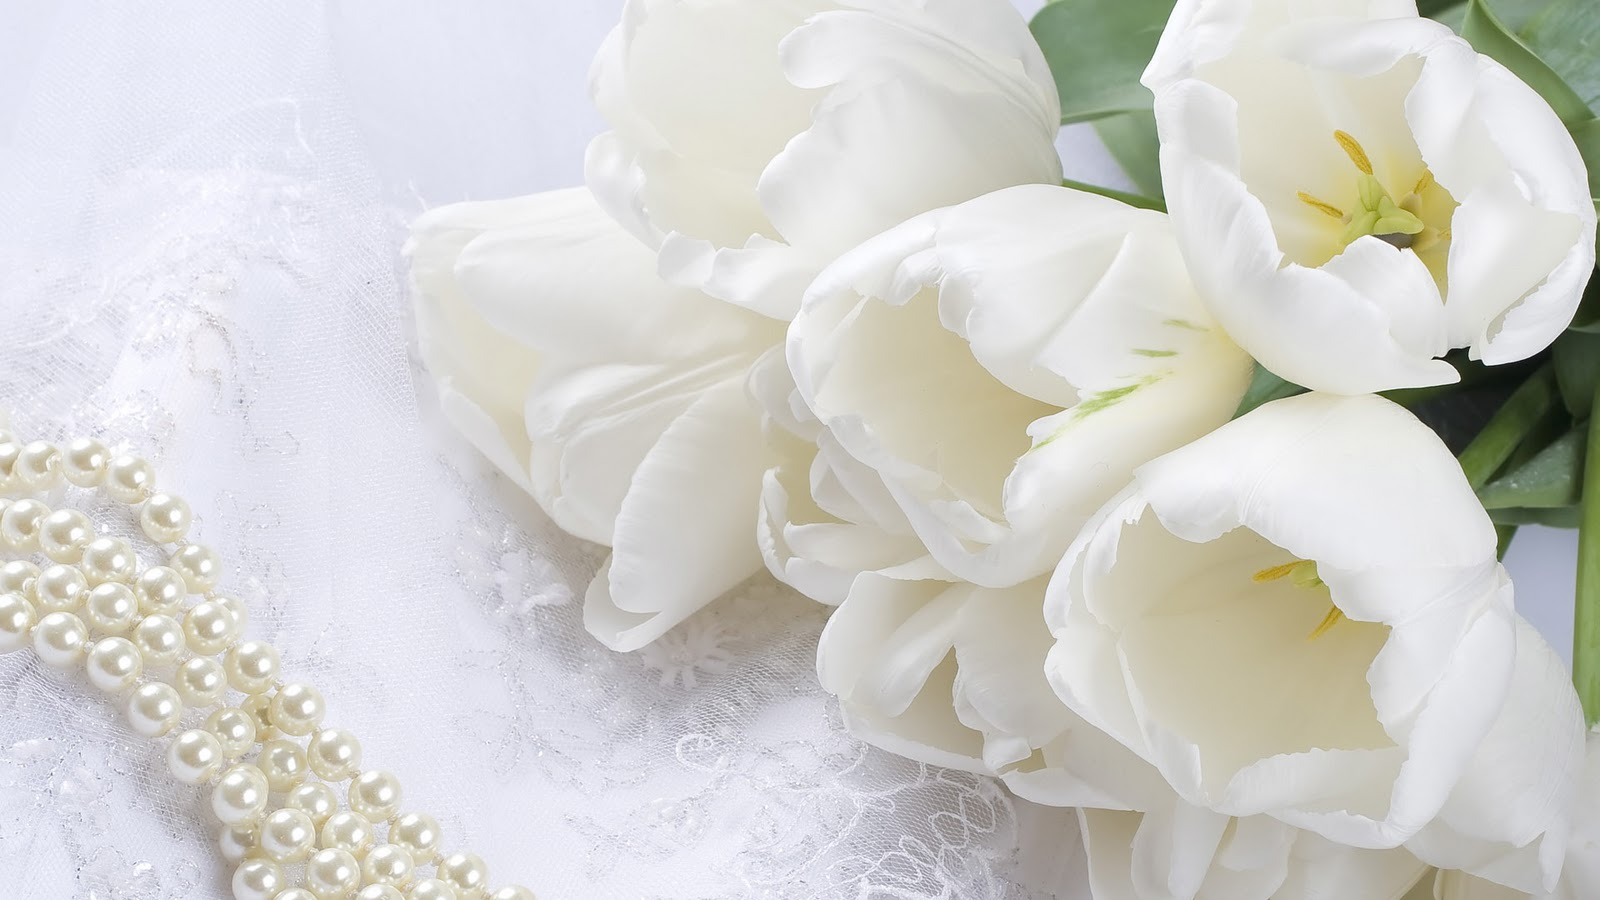 Zeeshan news most beautiful flower hd wallpaper voltagebd Images